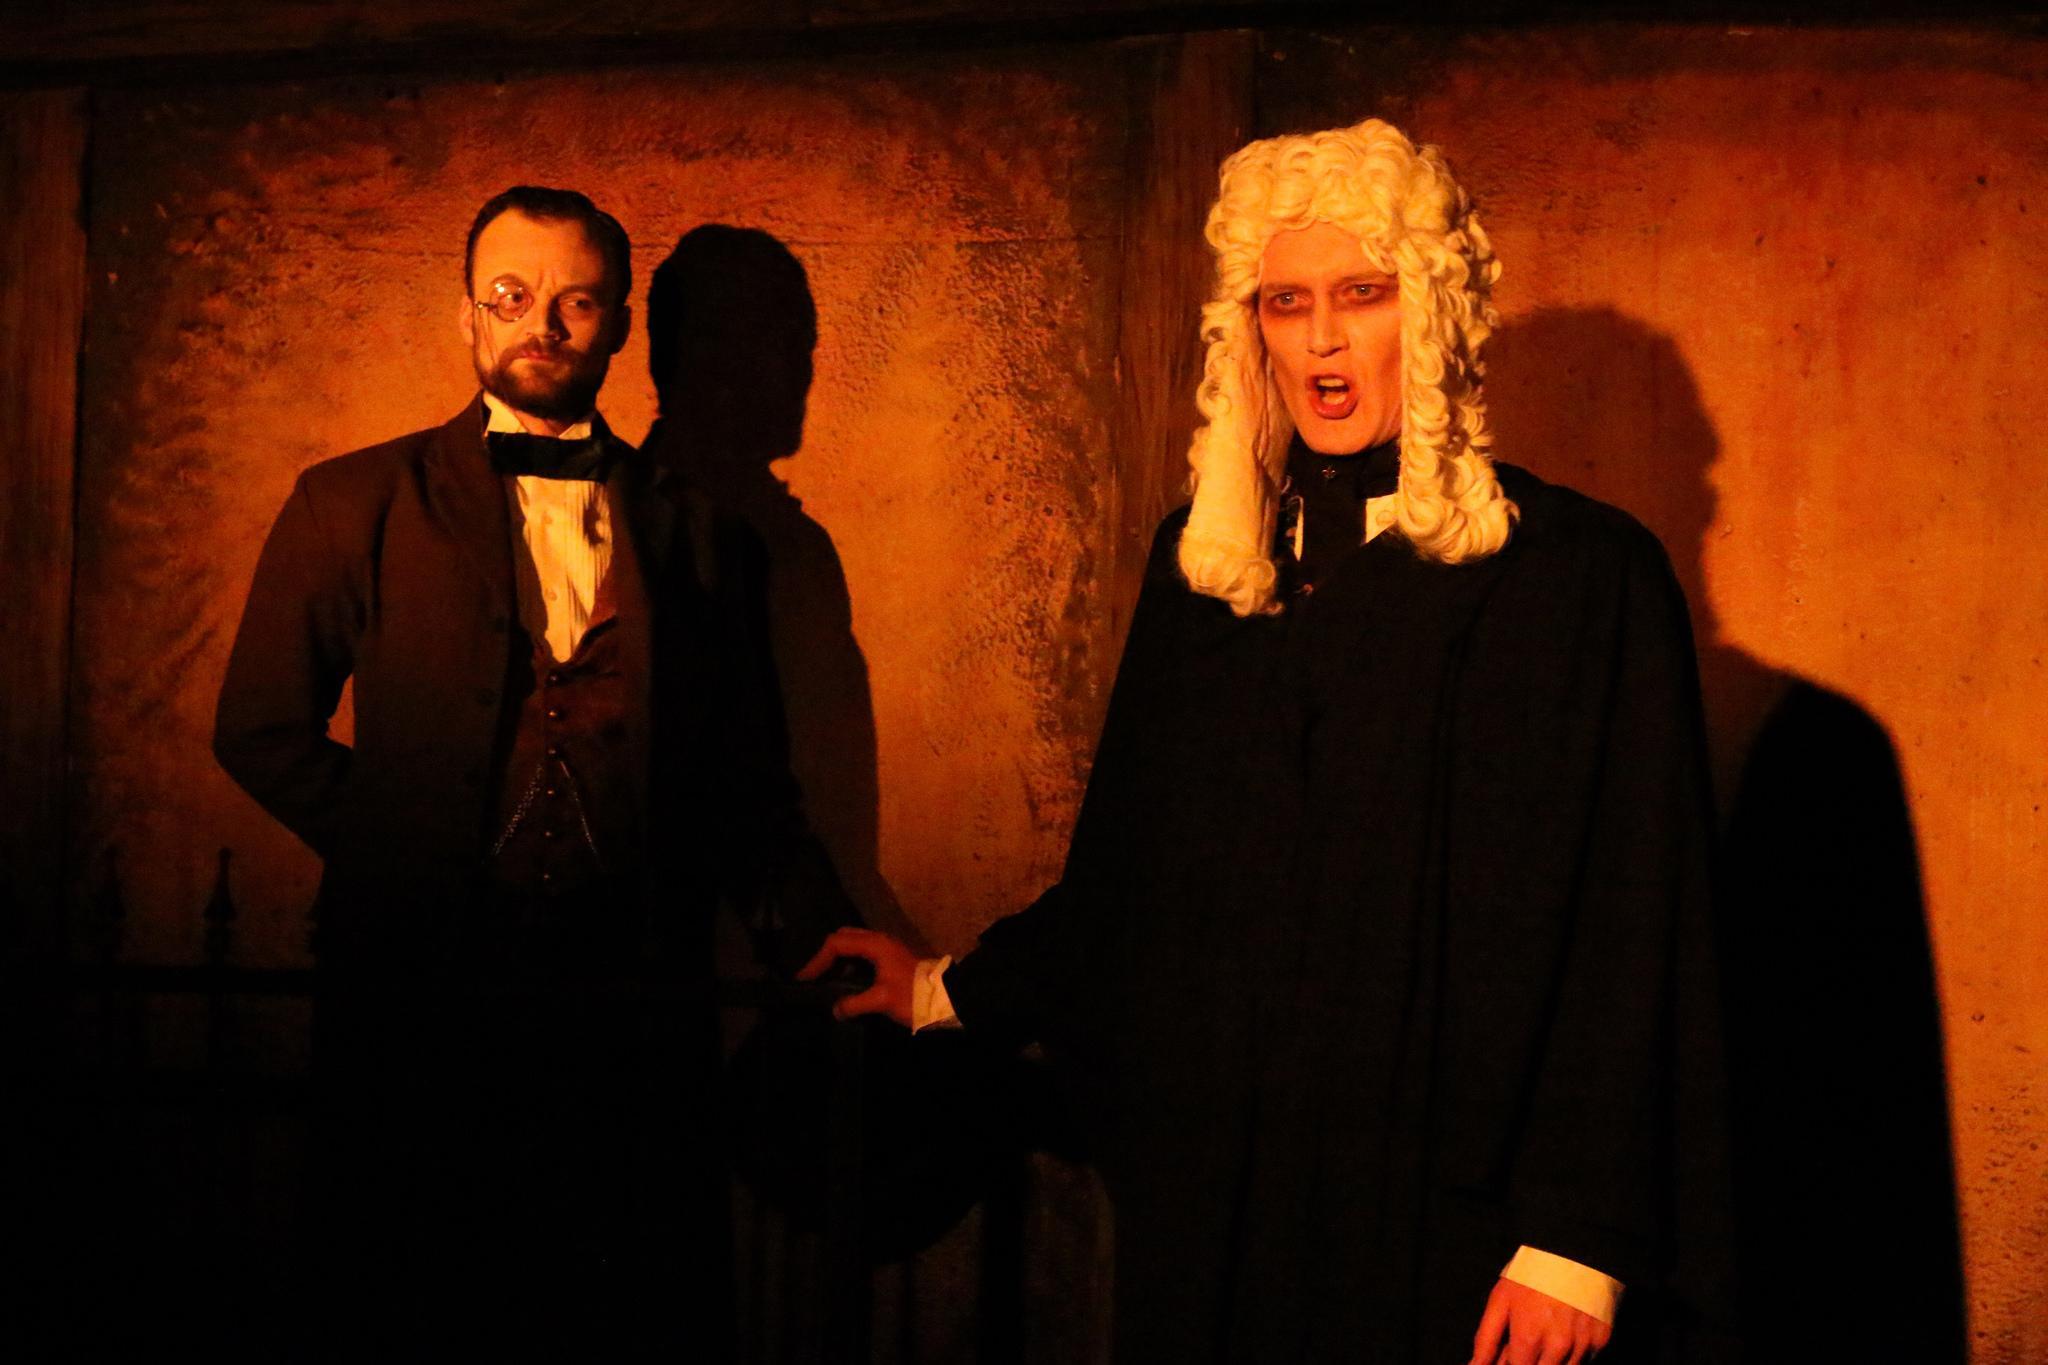 Kevin Webb as Beadle Bamford and John B. Leen as Judge Turpin. Photo Credit: Cody Jolly